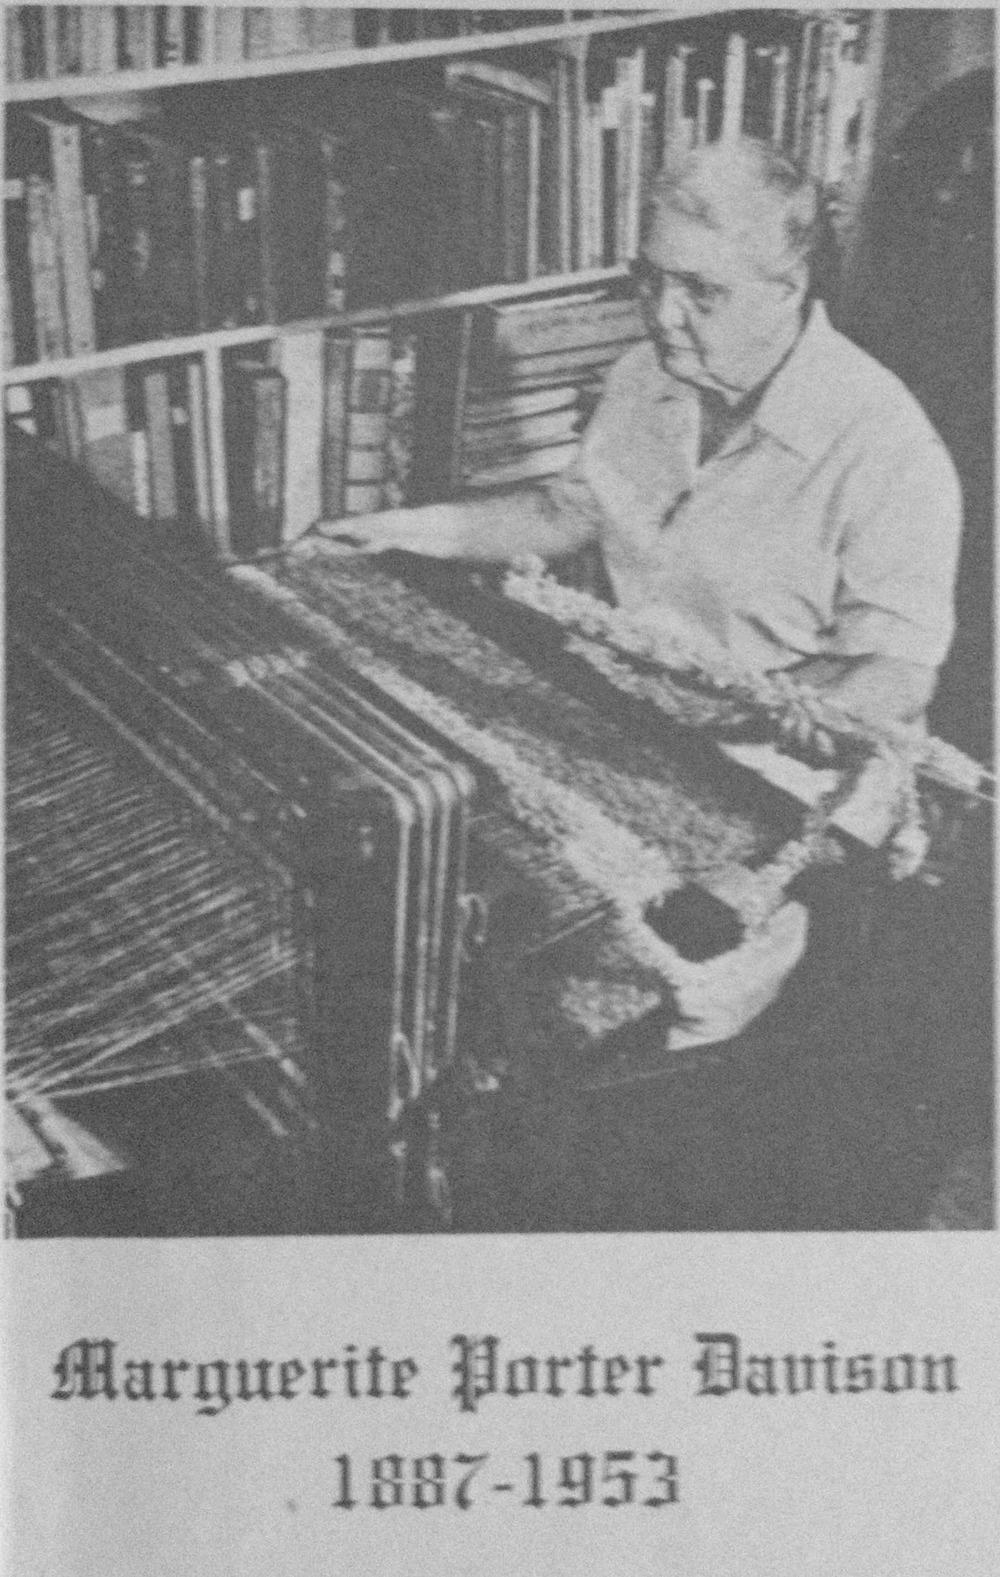 Marguerite Porter Davidson